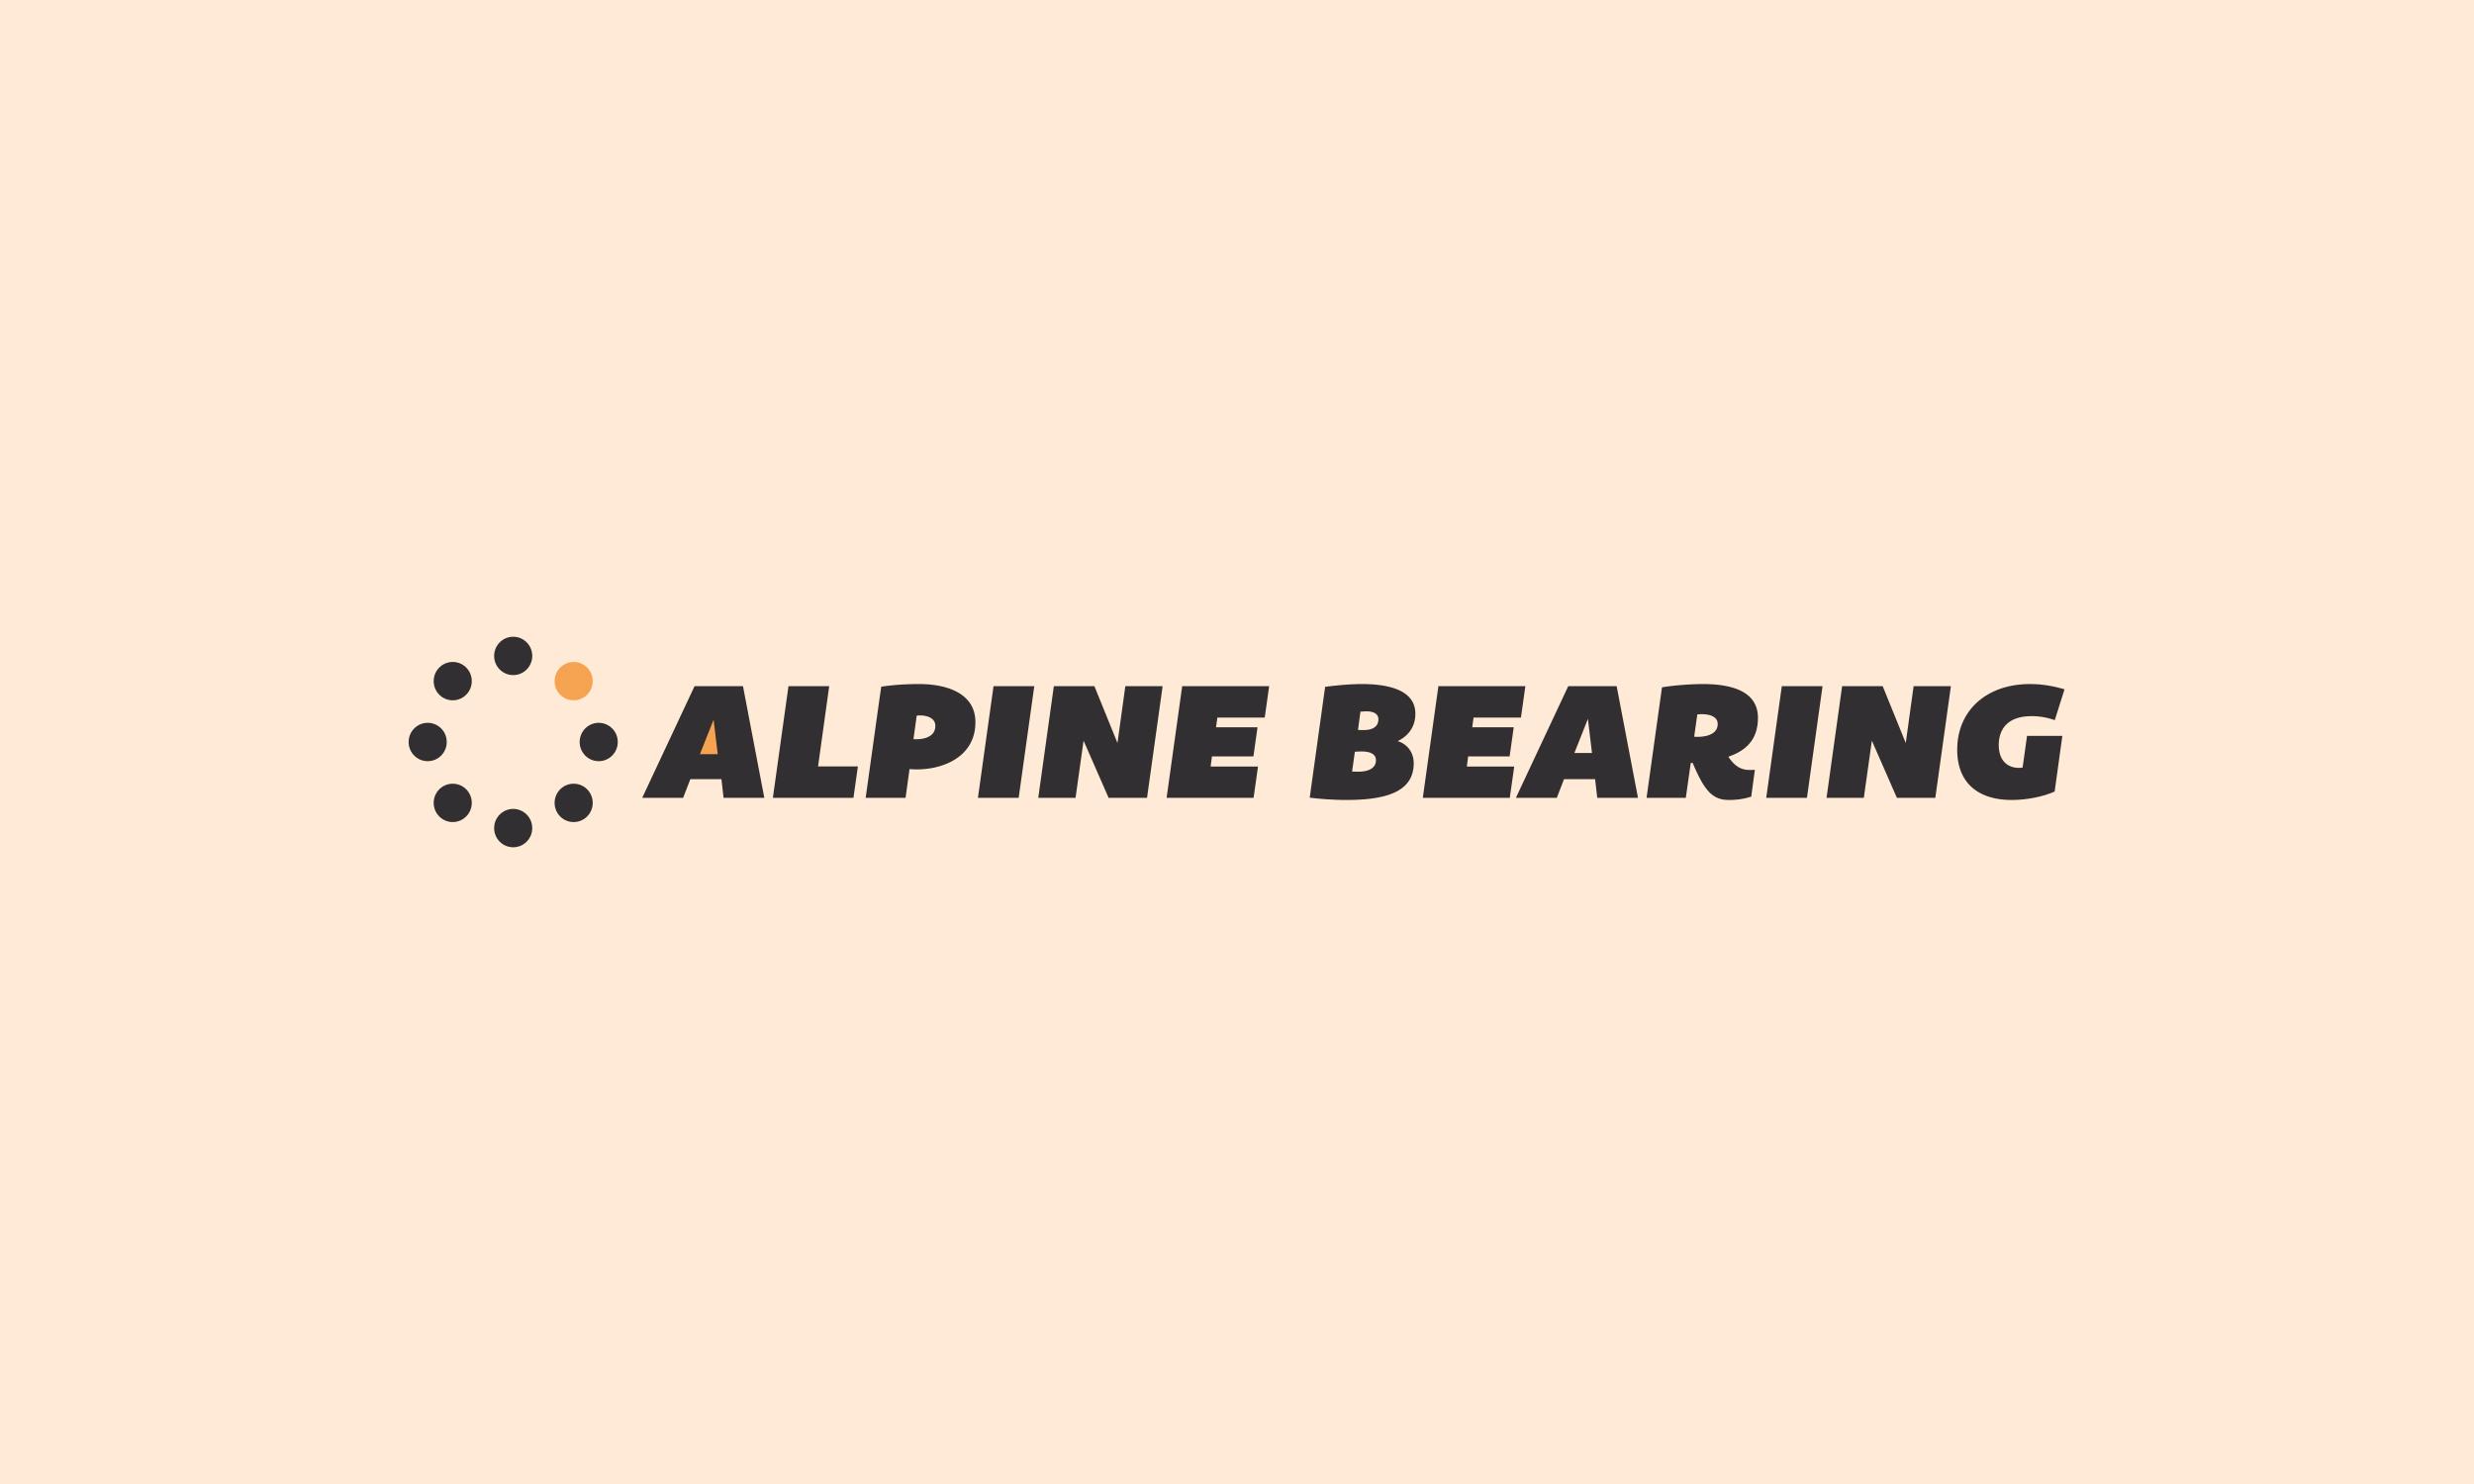 ALPINE BEARING ANNUAL REPORT